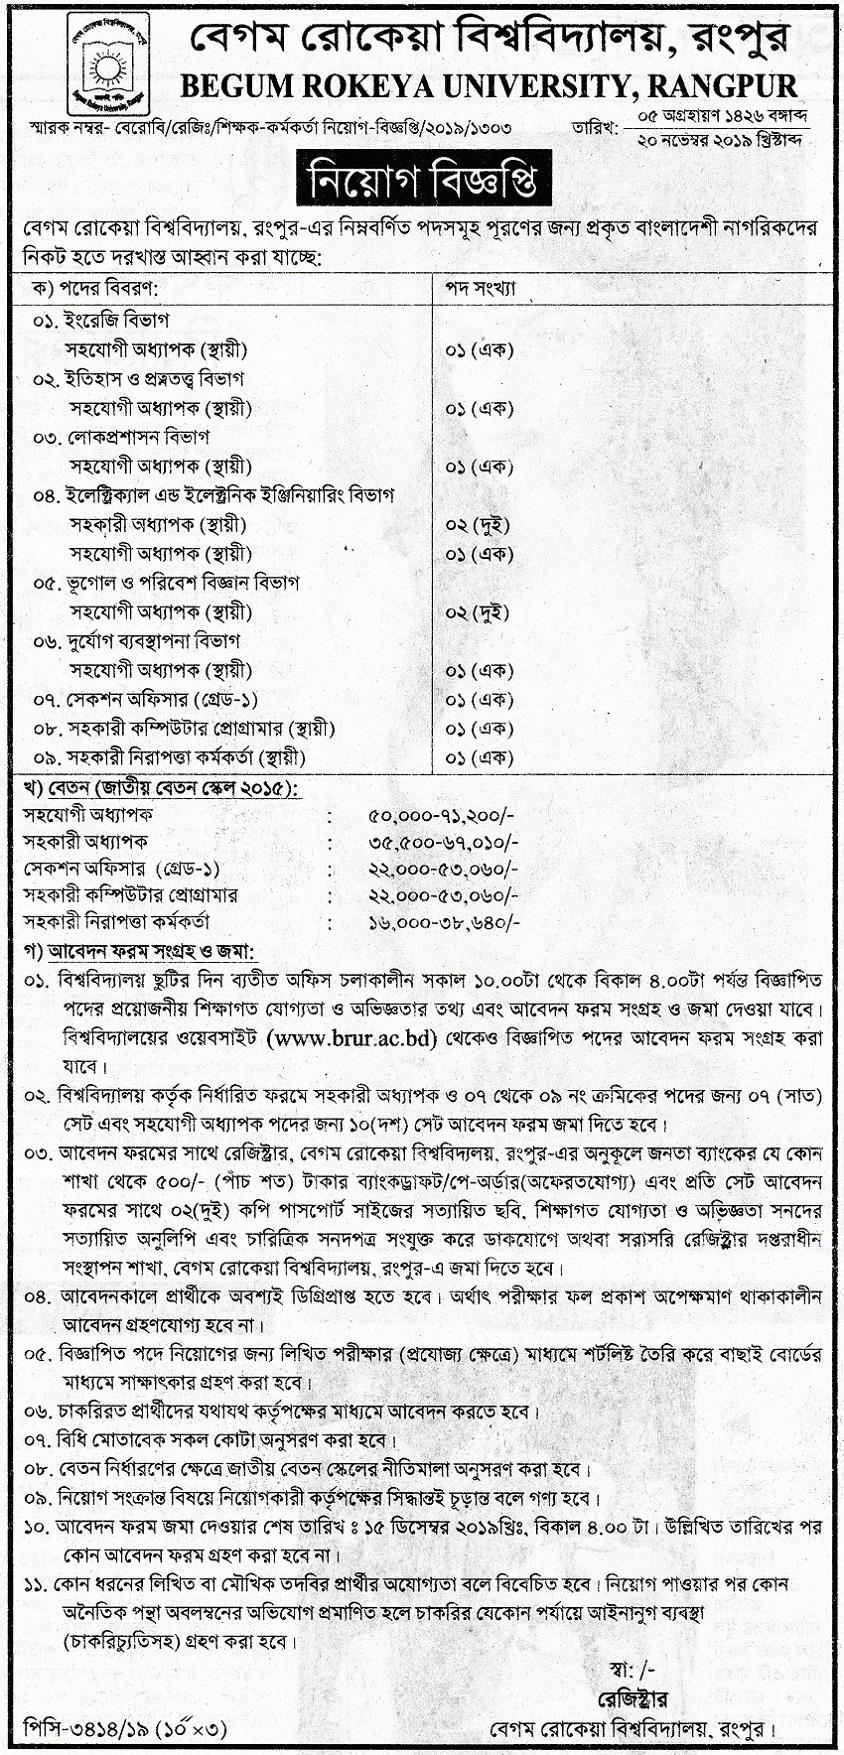 Begum Rokeya University Job Circular 201